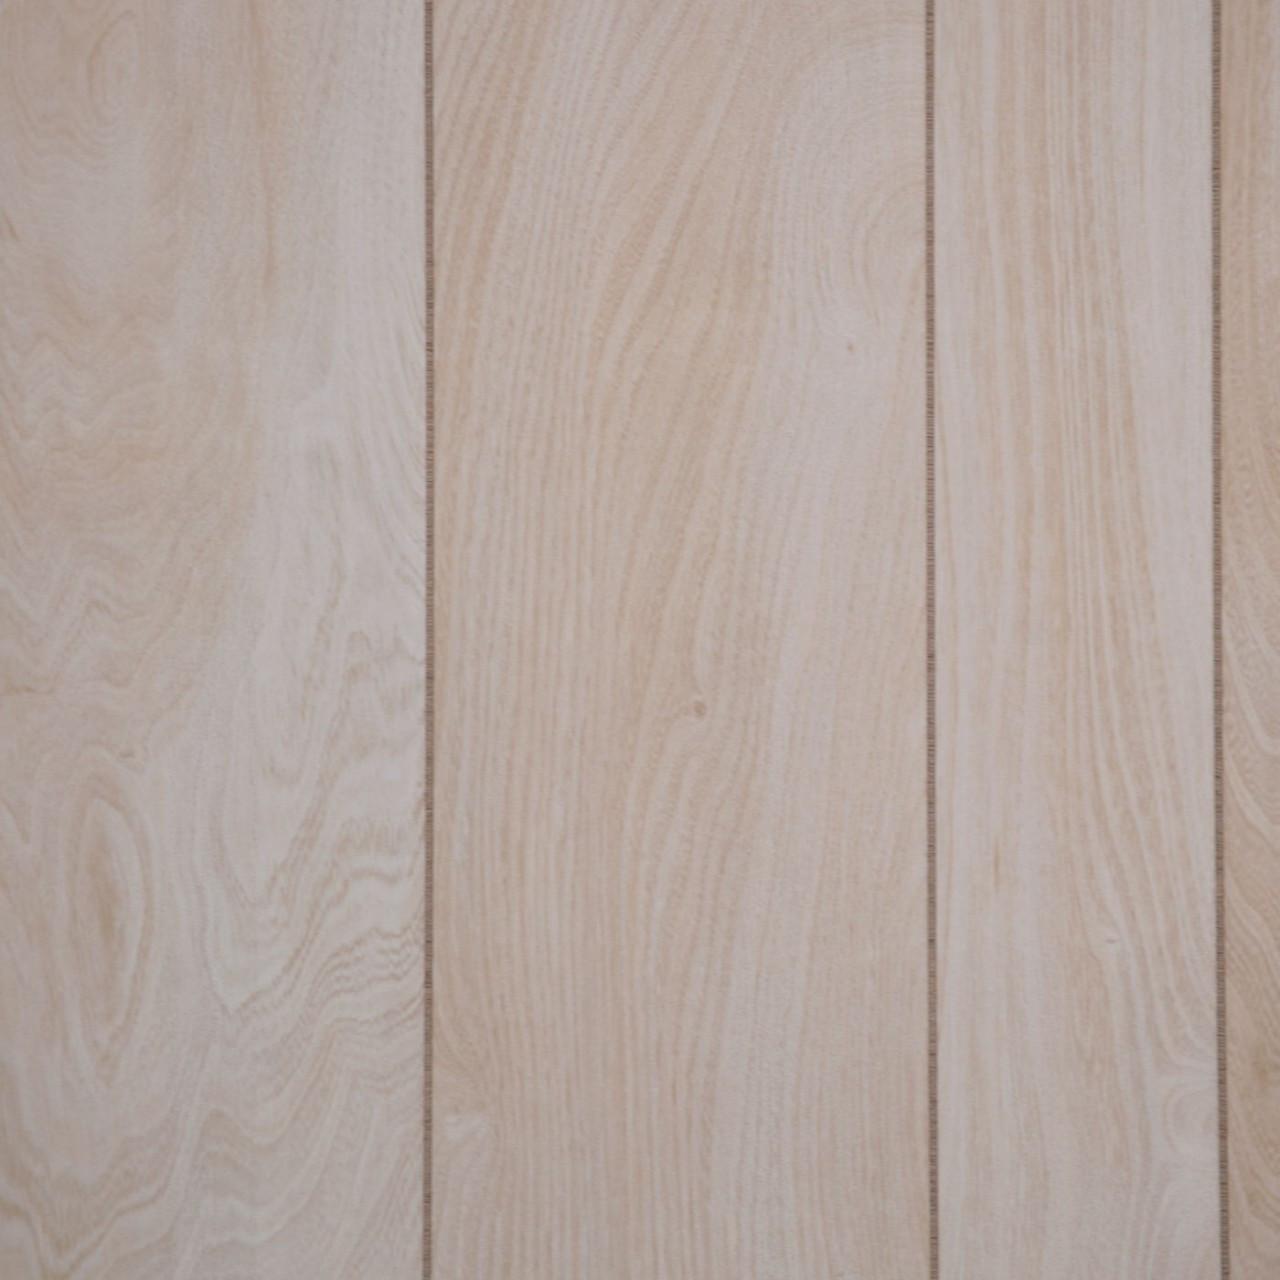 Wood Paneling 4x8 Sheets